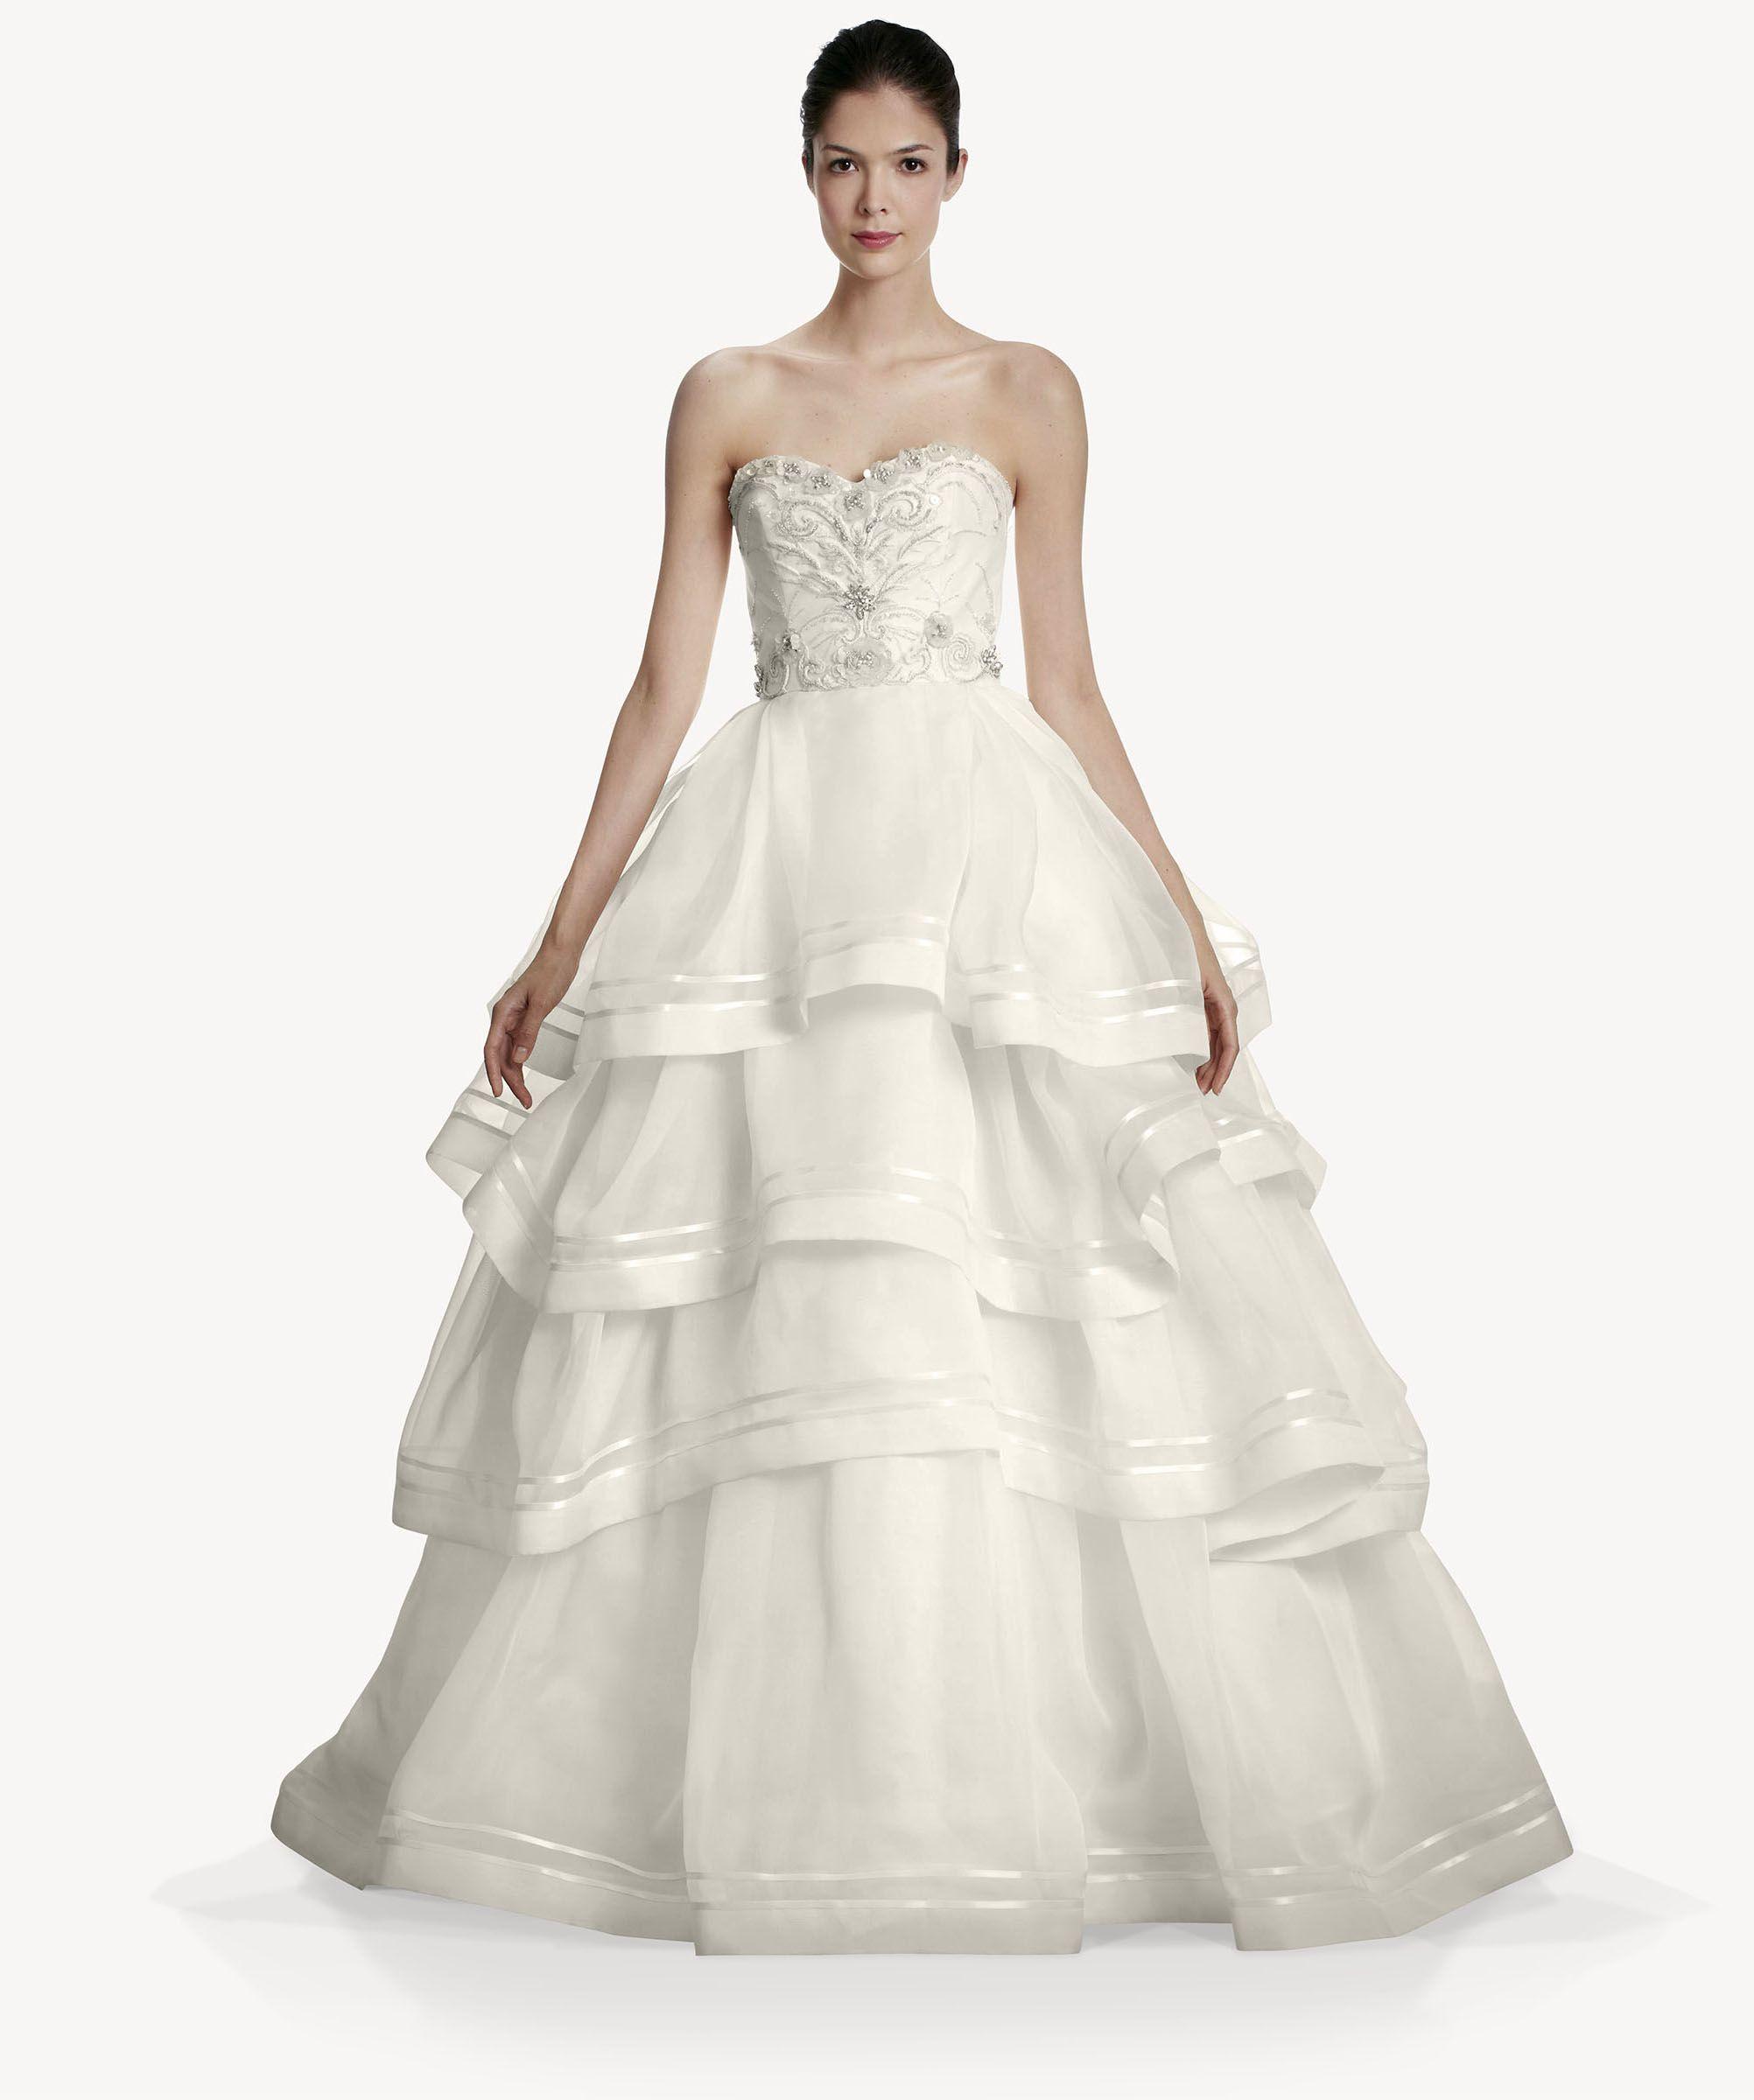 Impresionante vestido de novias de Carolina Herrera. Precioso.